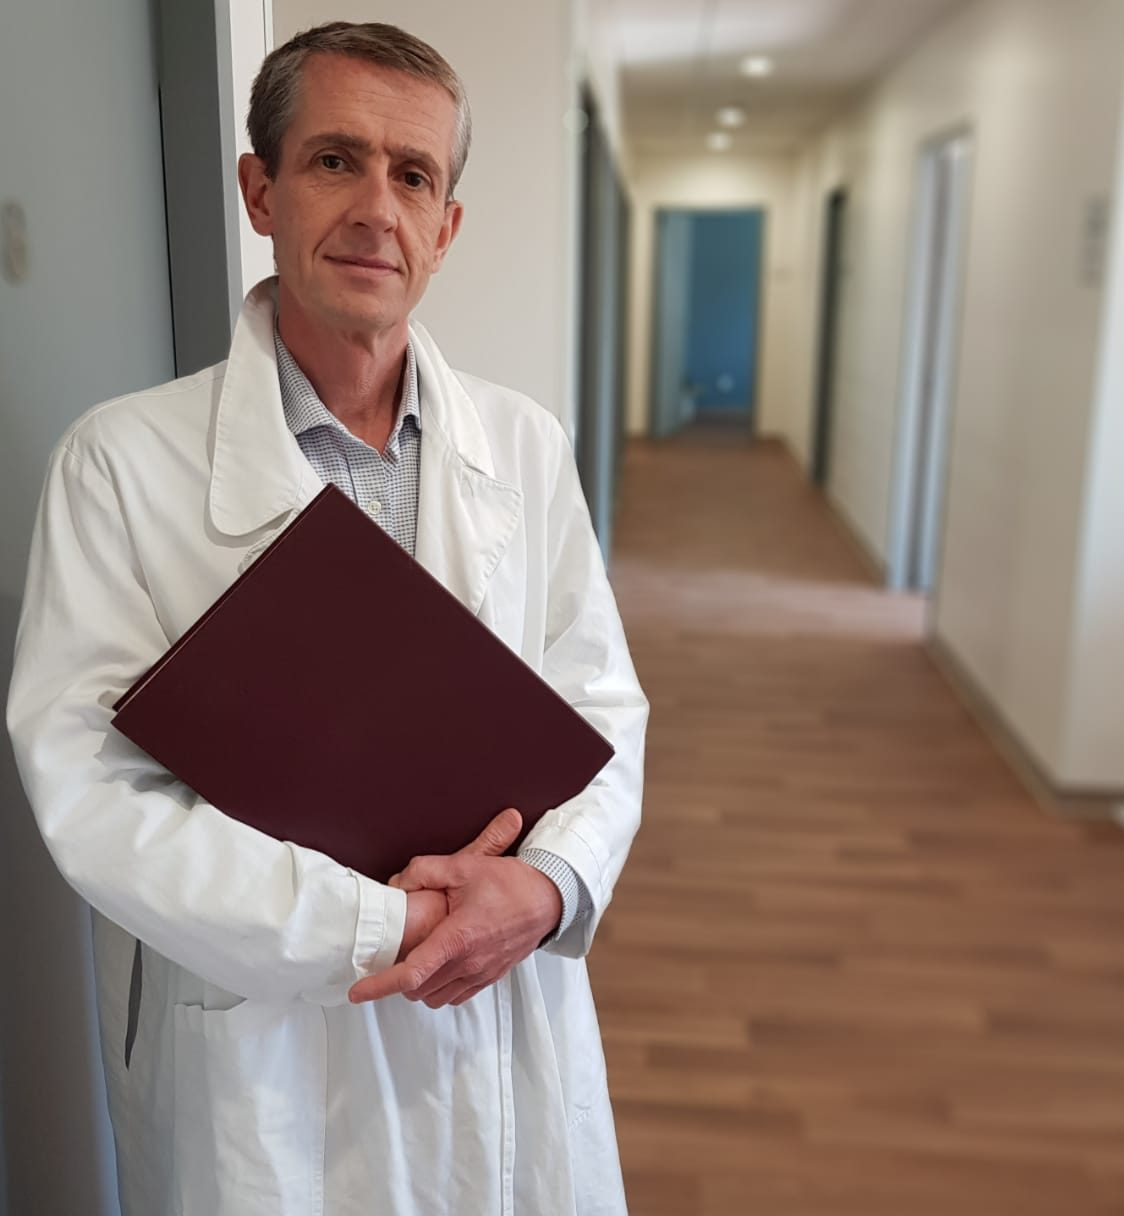 docteur-eric-olagne-chirurgien-digestif-ucgt-lyon